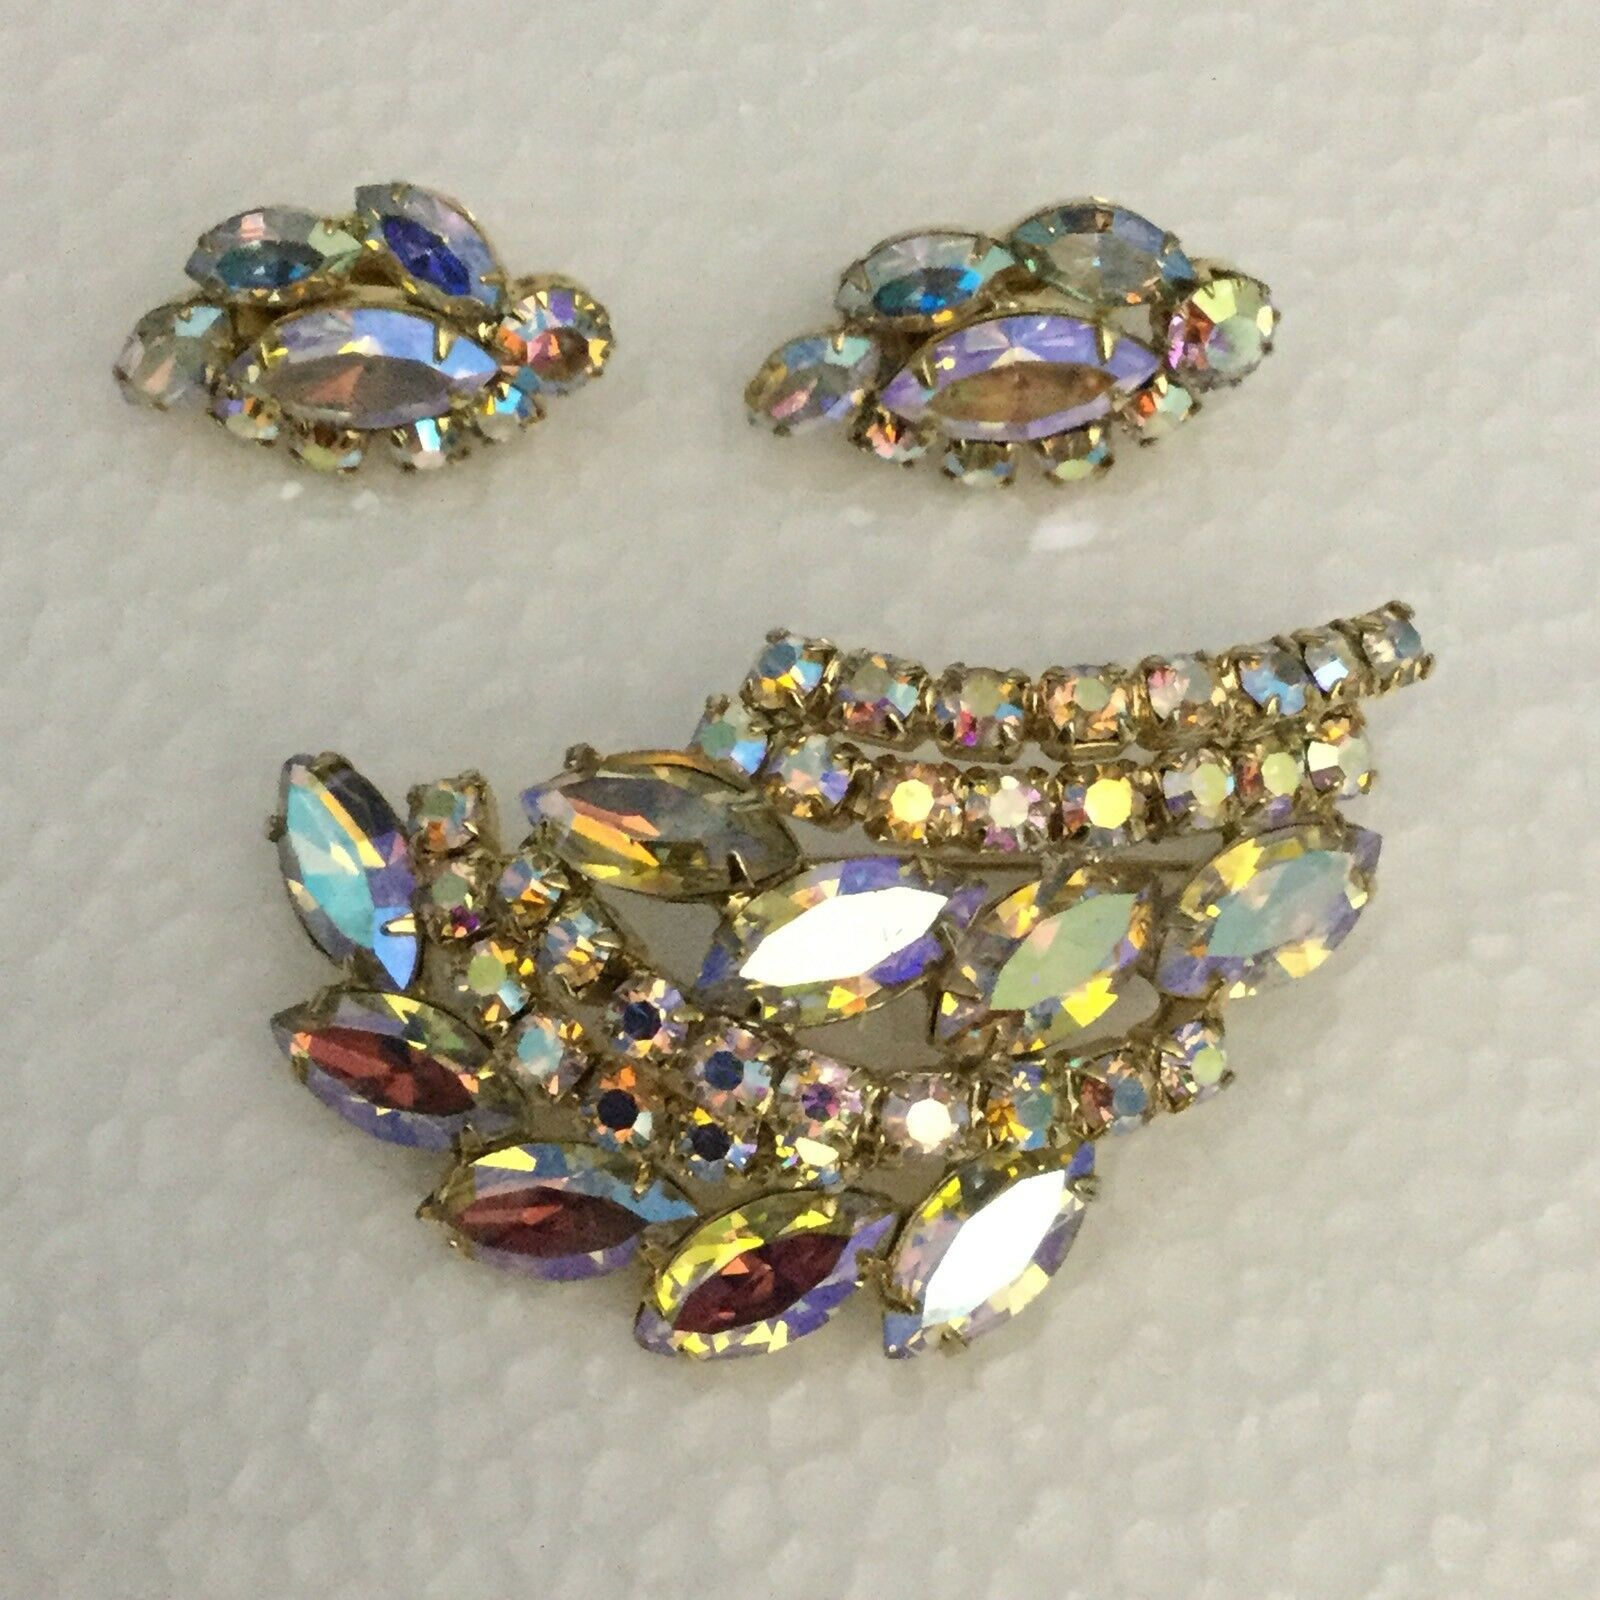 Vintage Rhinestone Brooch Earrings Set Marquis AB Stones goldtone Purple Large